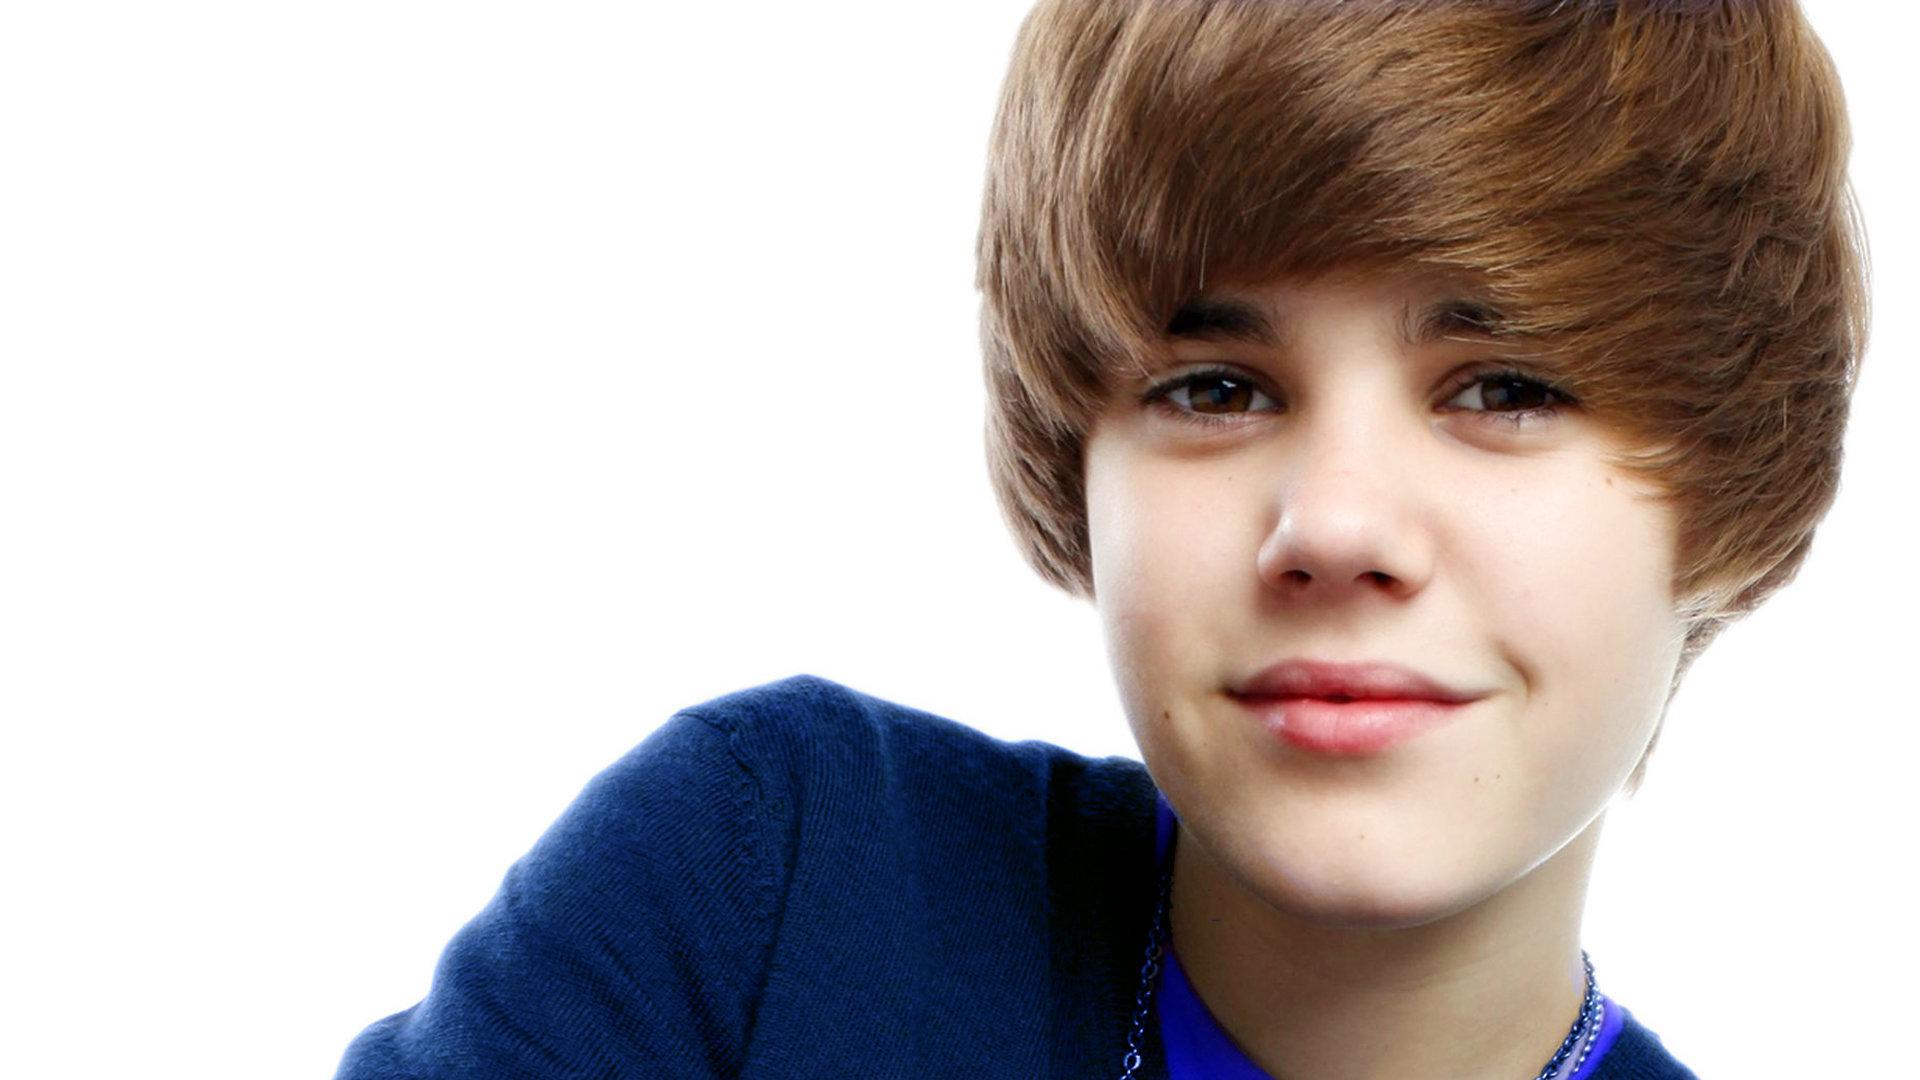 http://1.bp.blogspot.com/-gI6H7xf5iKc/UP65oNCOZoI/AAAAAAAAF2E/LScwPqZr8P4/s4000/Justin+Bieber+Wallpaper+HD+2013+23.jpeg